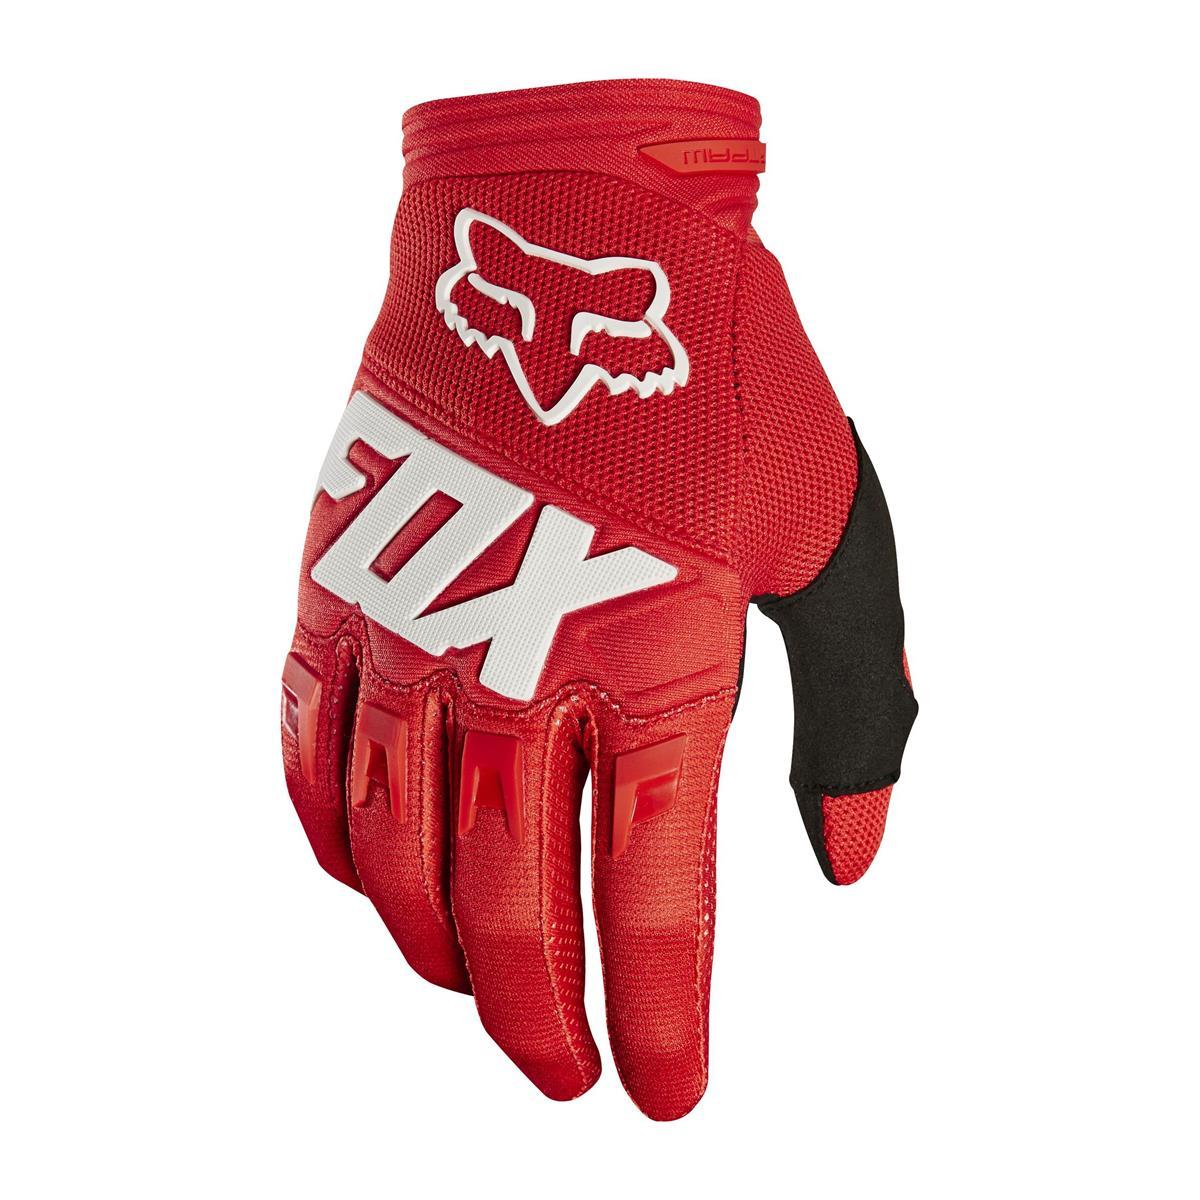 Fox Handschuhe Dirtpaw Rot